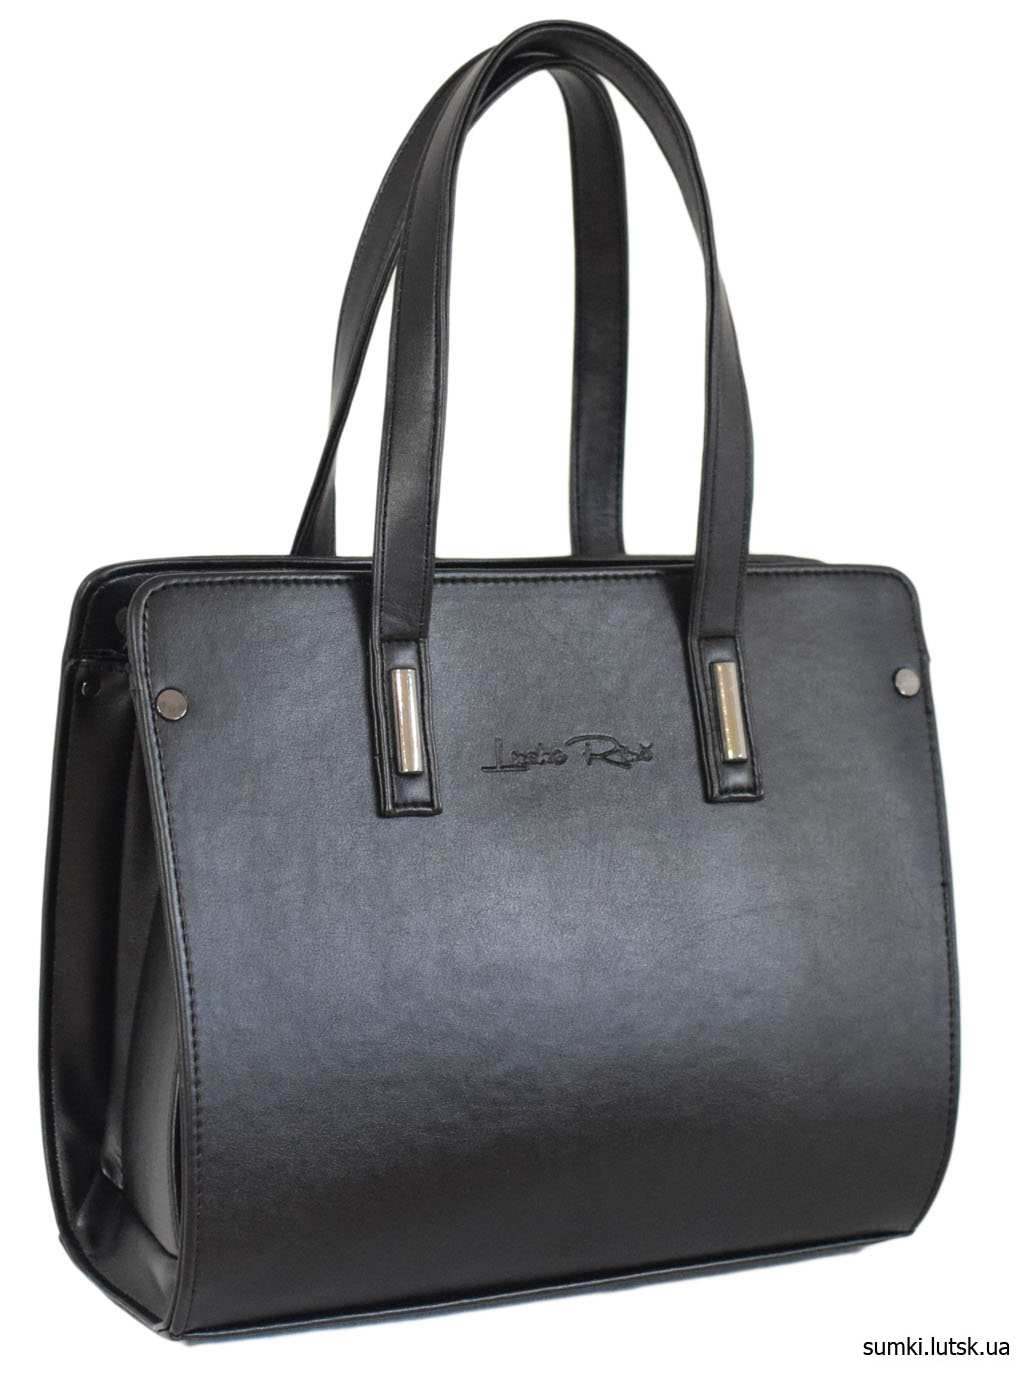 71dd808ae04148 Вишукана каркасна сумка класичного стилю створена українським виробником ТМ